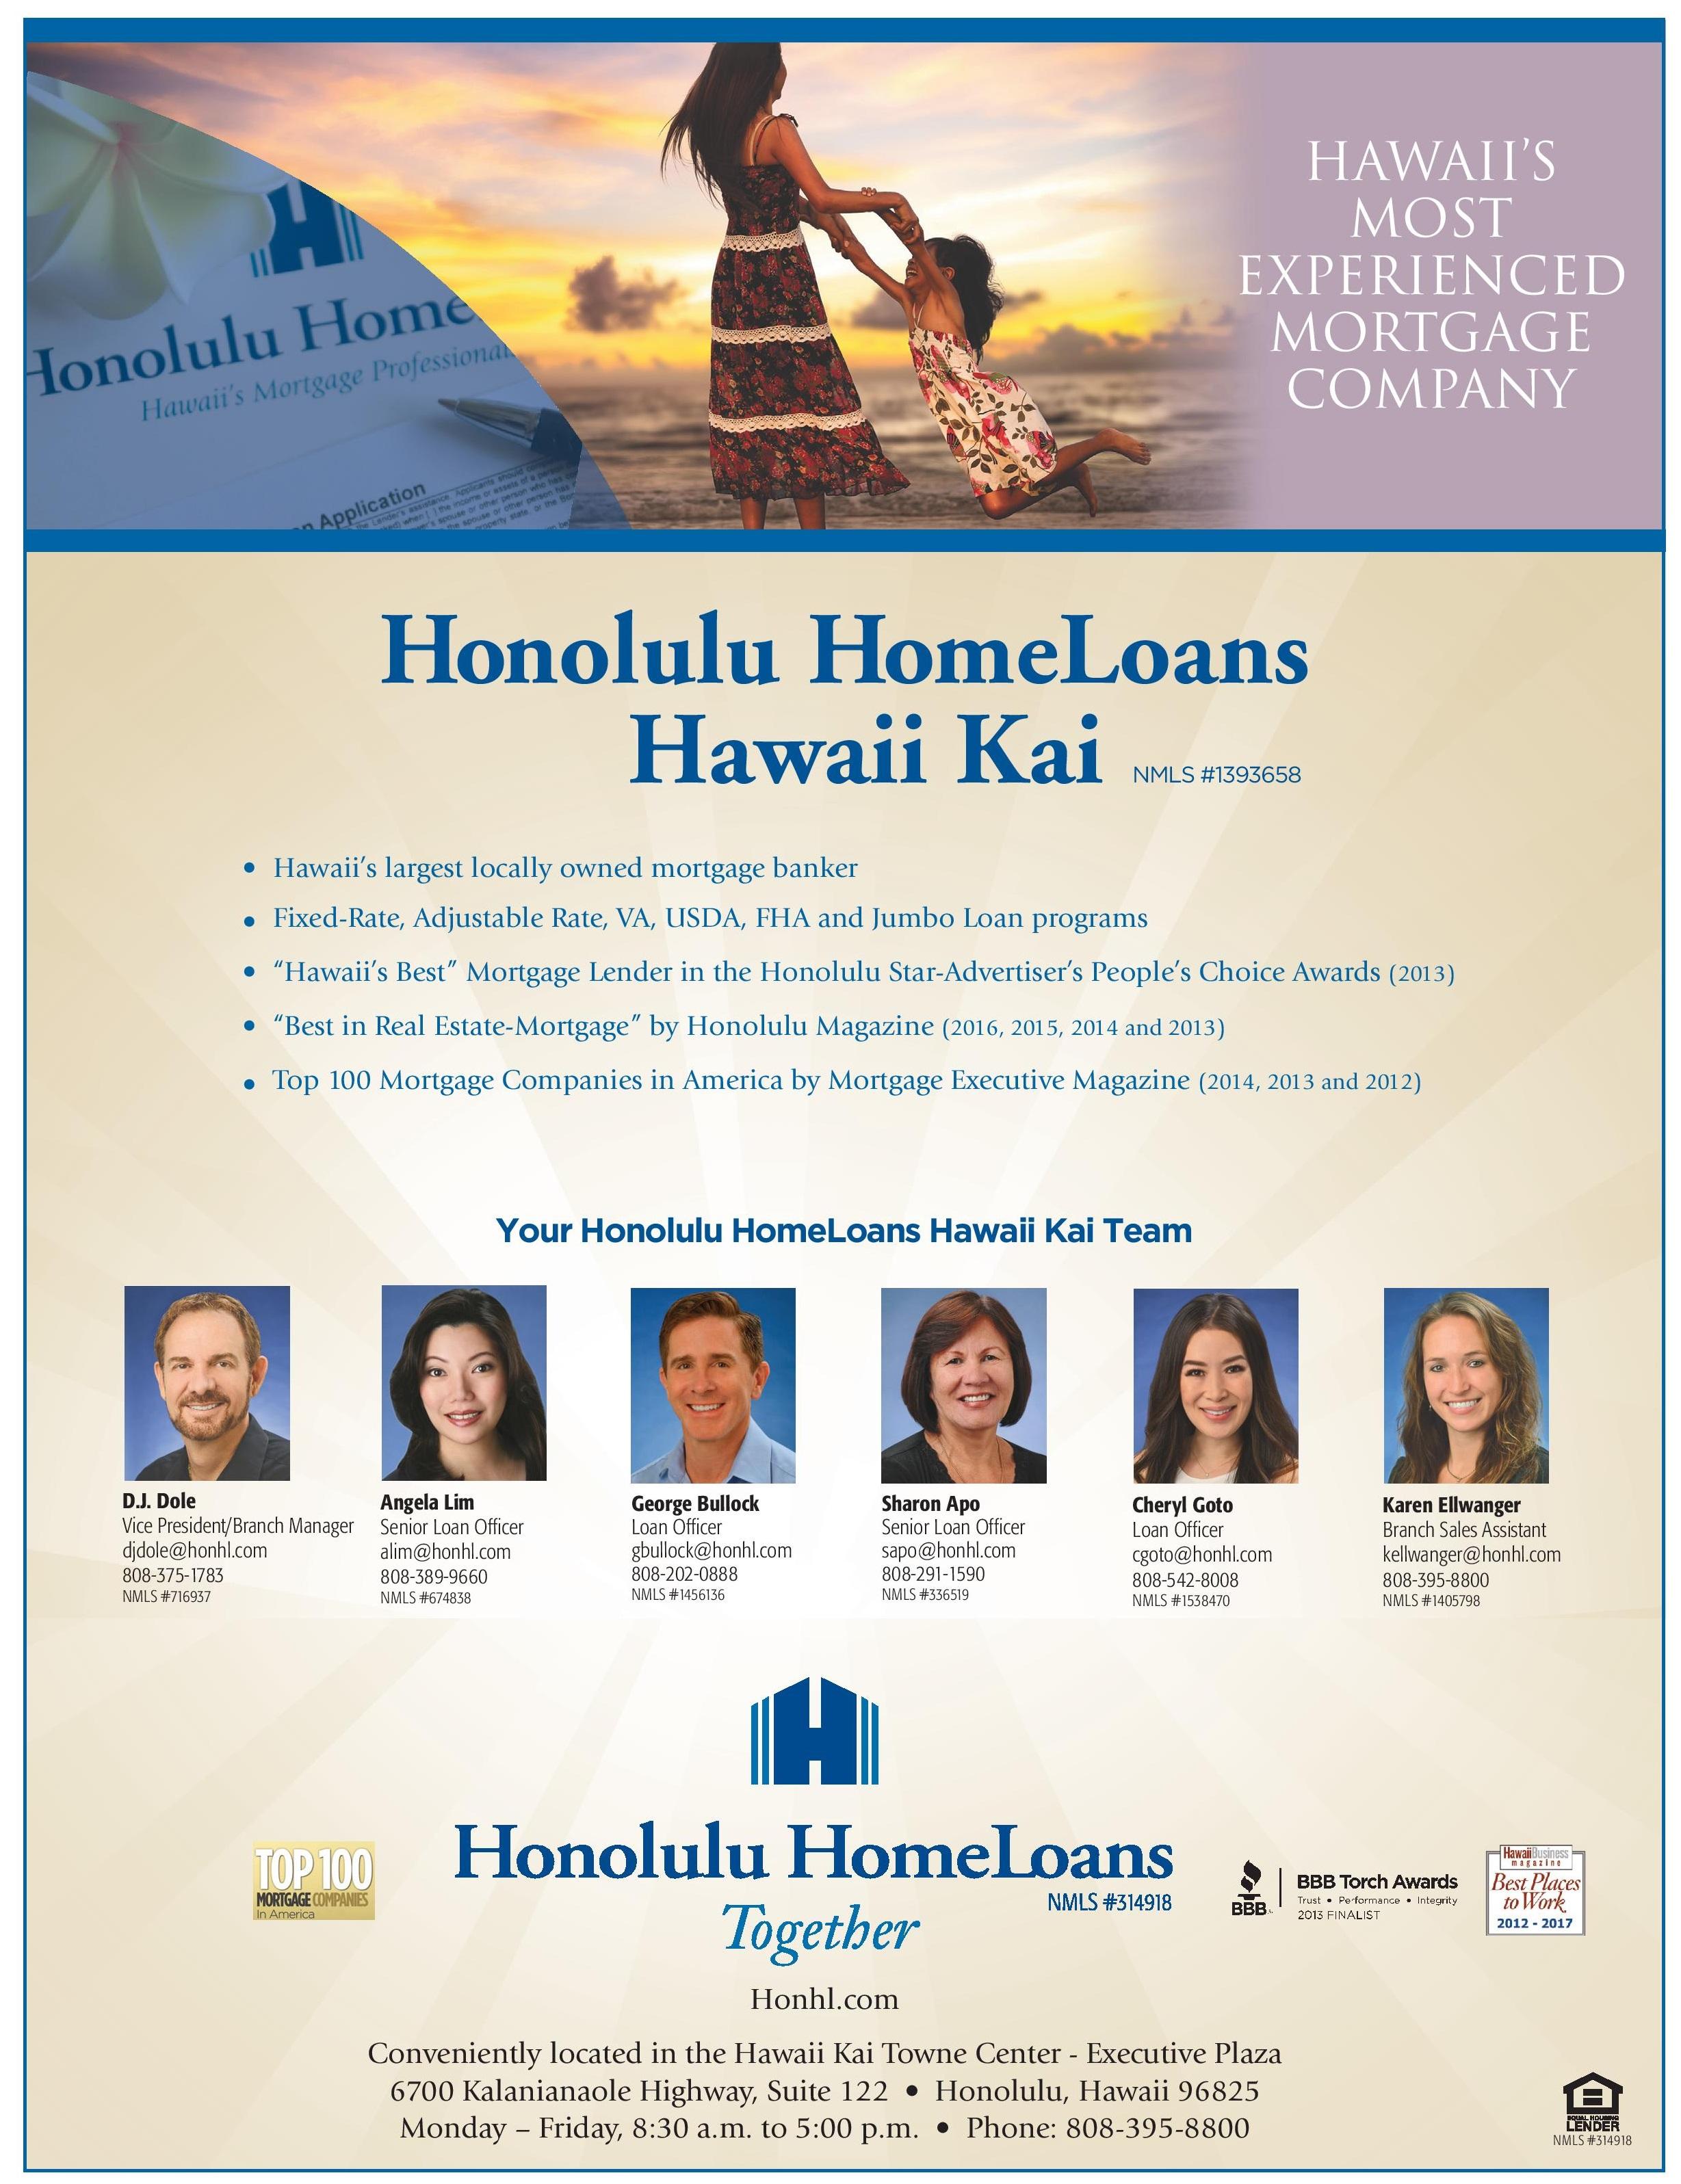 HawaiiKai_Image